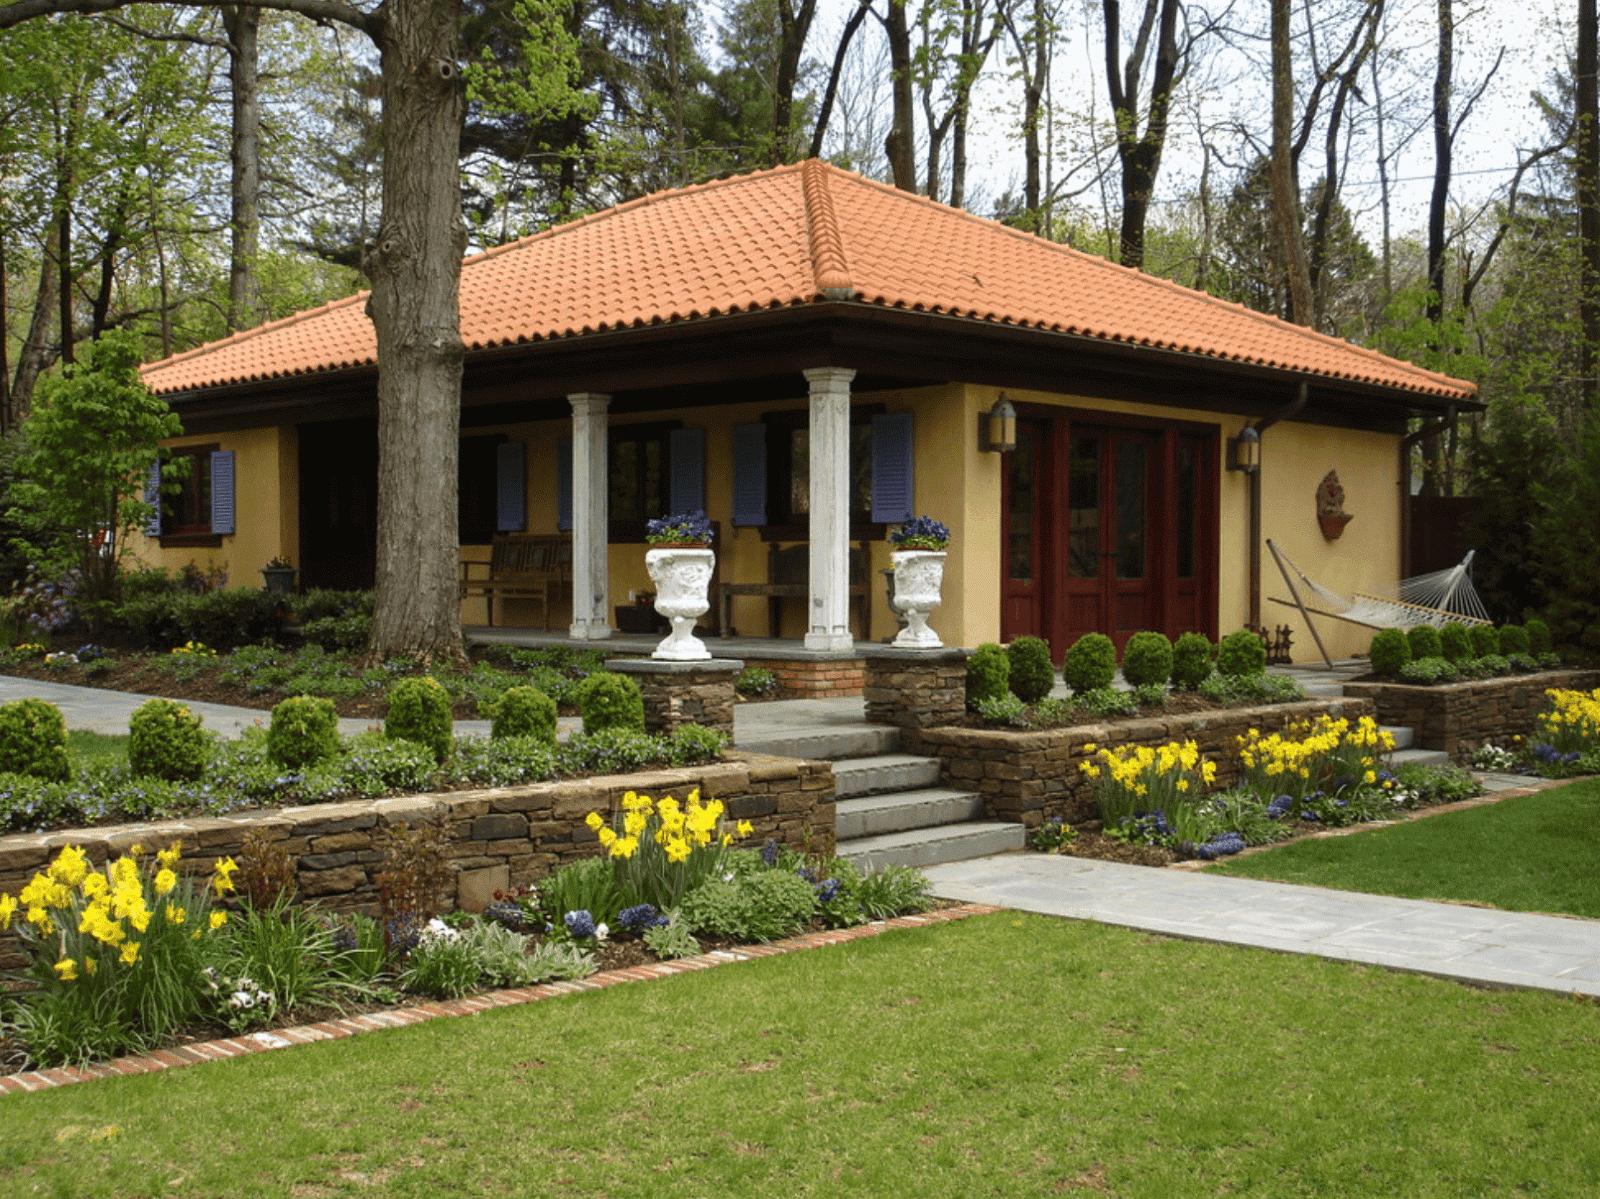 Decoraci n de casa u oficina modelos de casas de campo for Casas de campo economicas